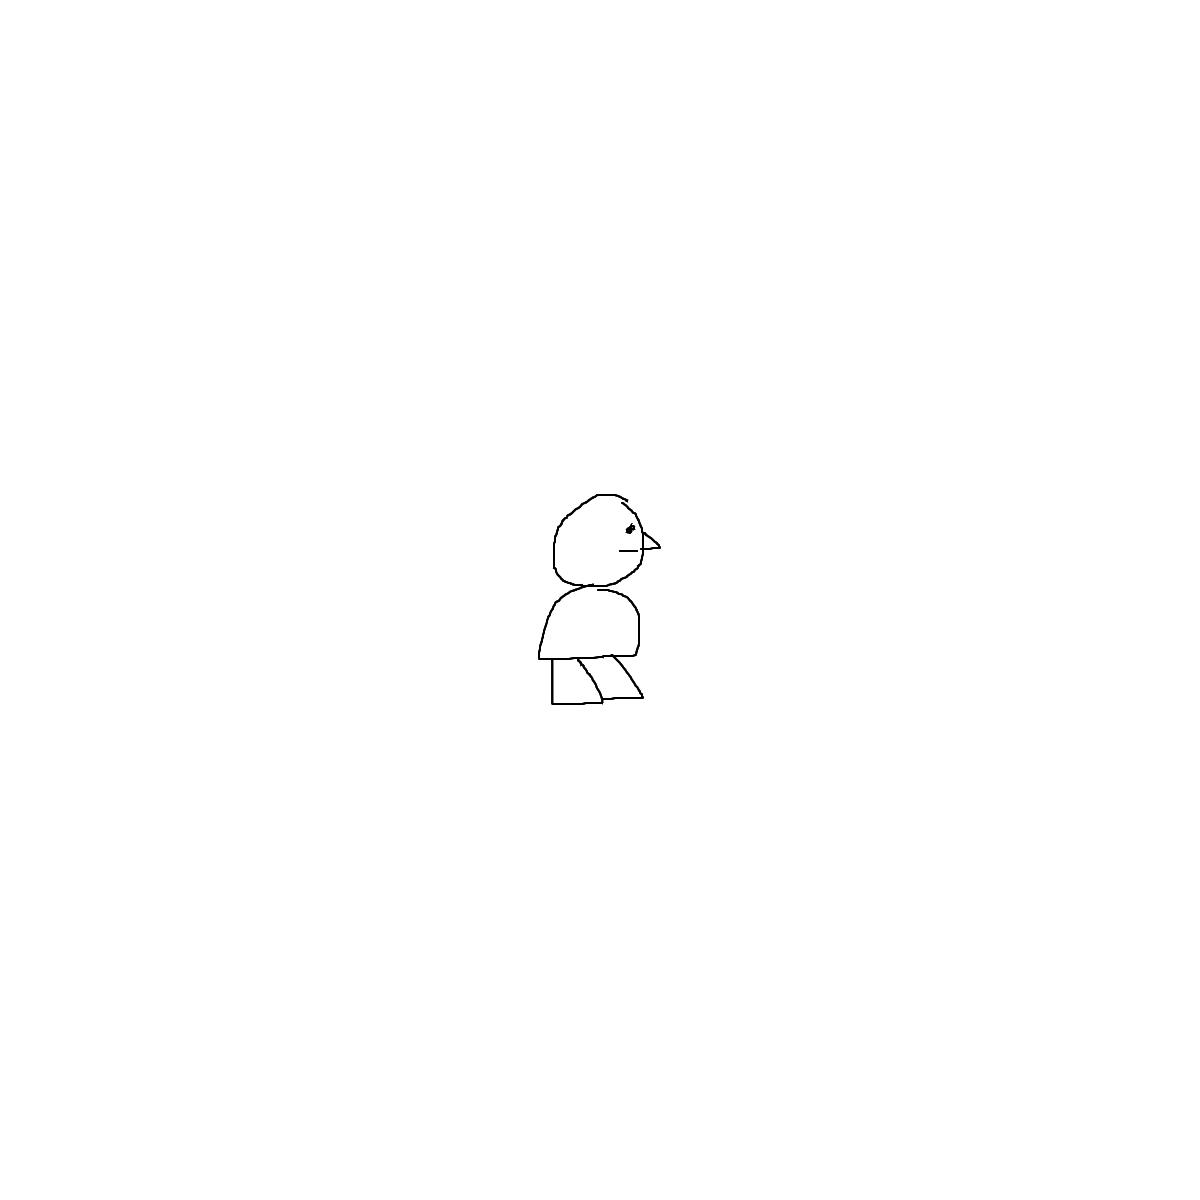 BAAAM drawing#24385 lat:51.5009346008300800lng: -0.1273687034845352